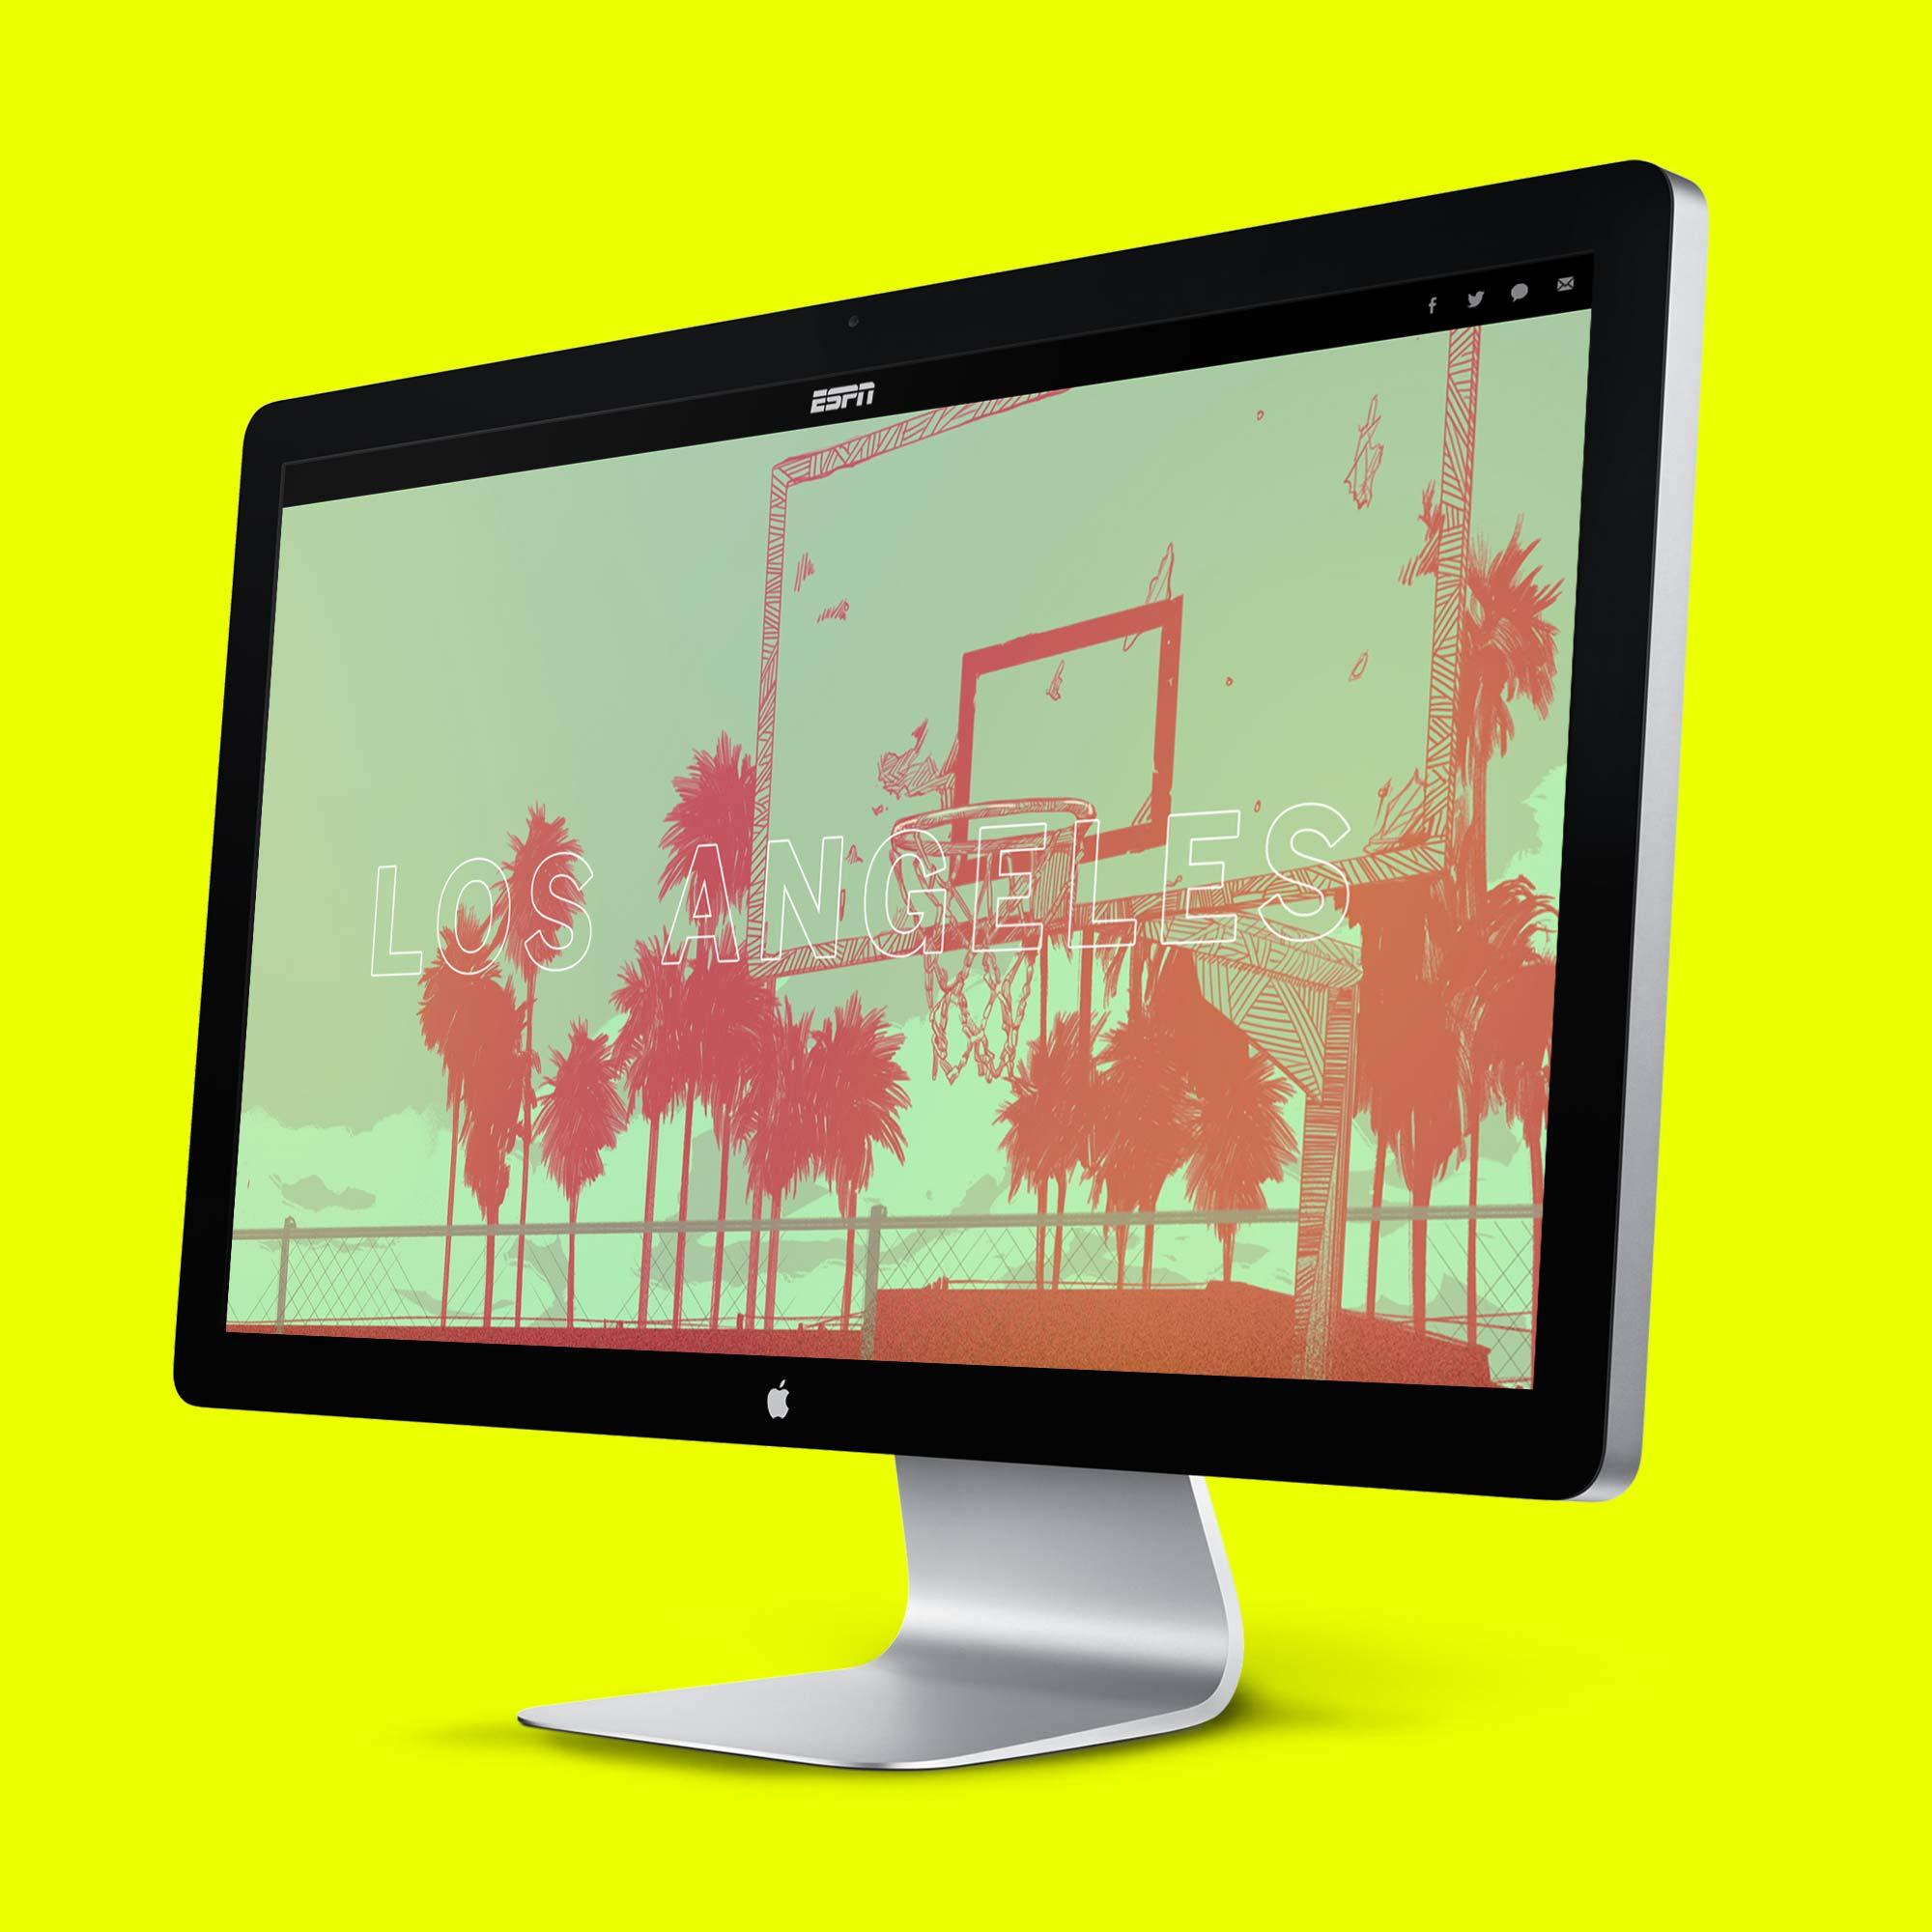 playgroundinsidedesktop.jpg